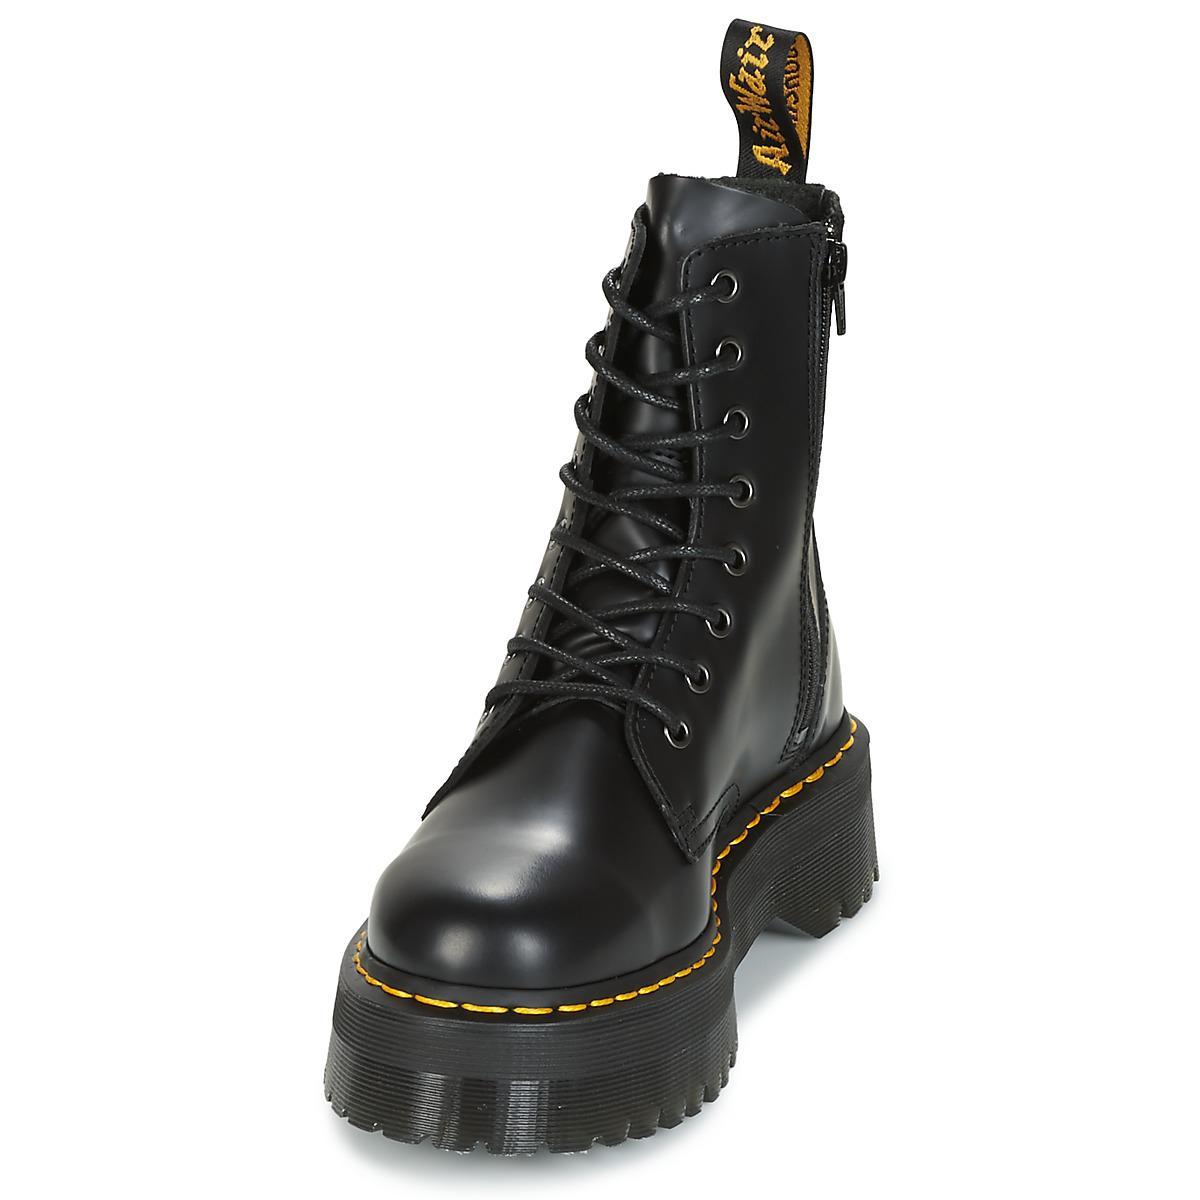 eea647834bdc Lyst Noir Boots Dr Coloris Jadon Martens En Femmes wwqa8P4